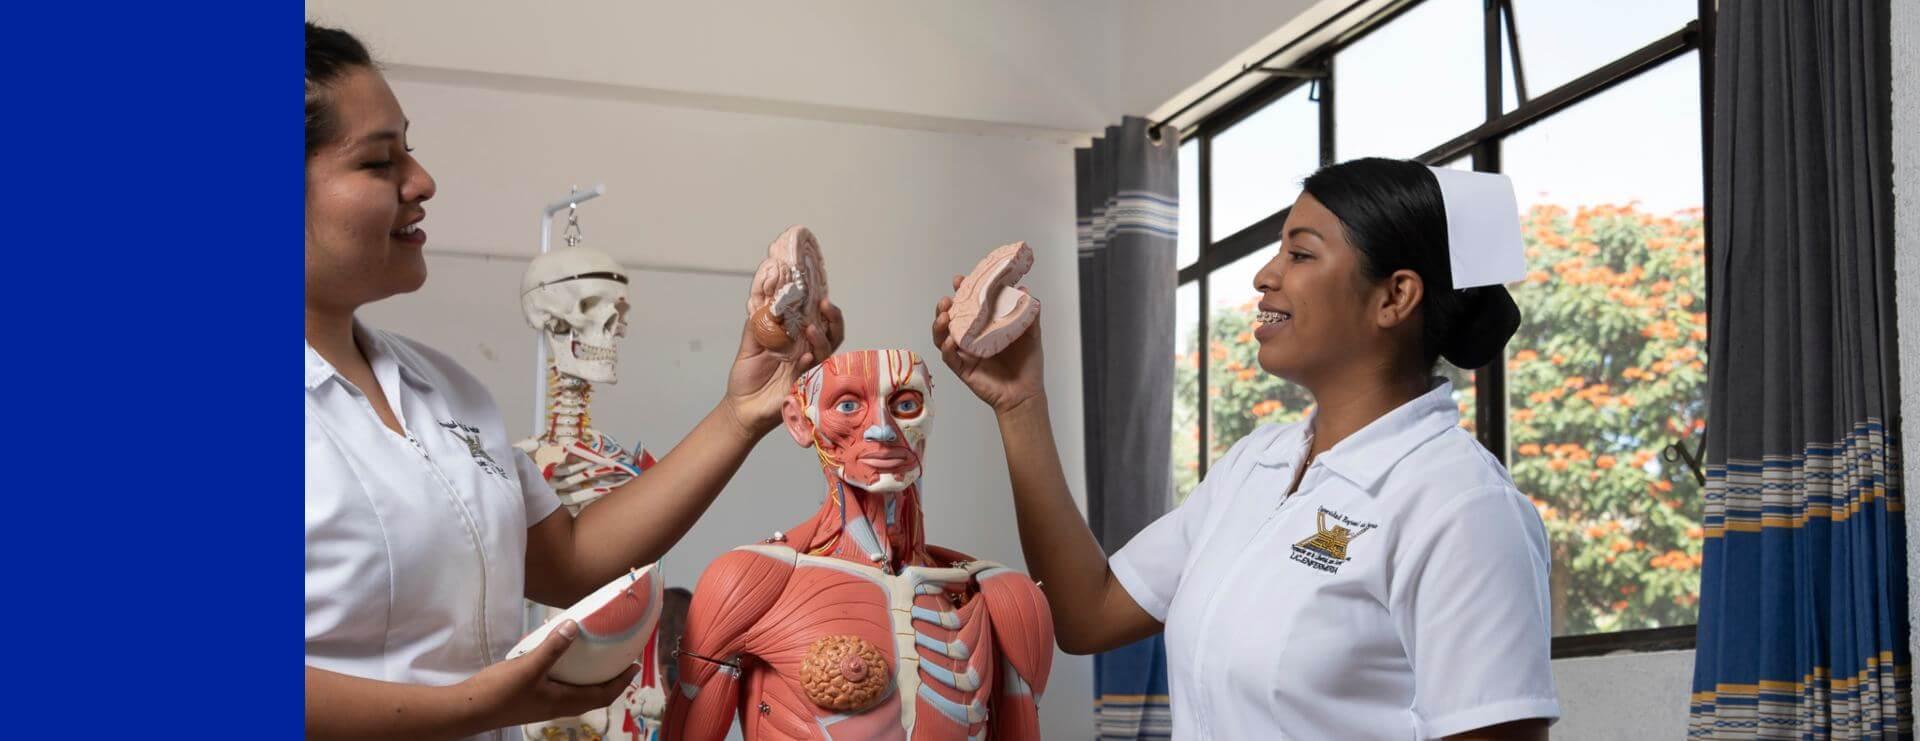 Escuela de enfermería en Oaxaca